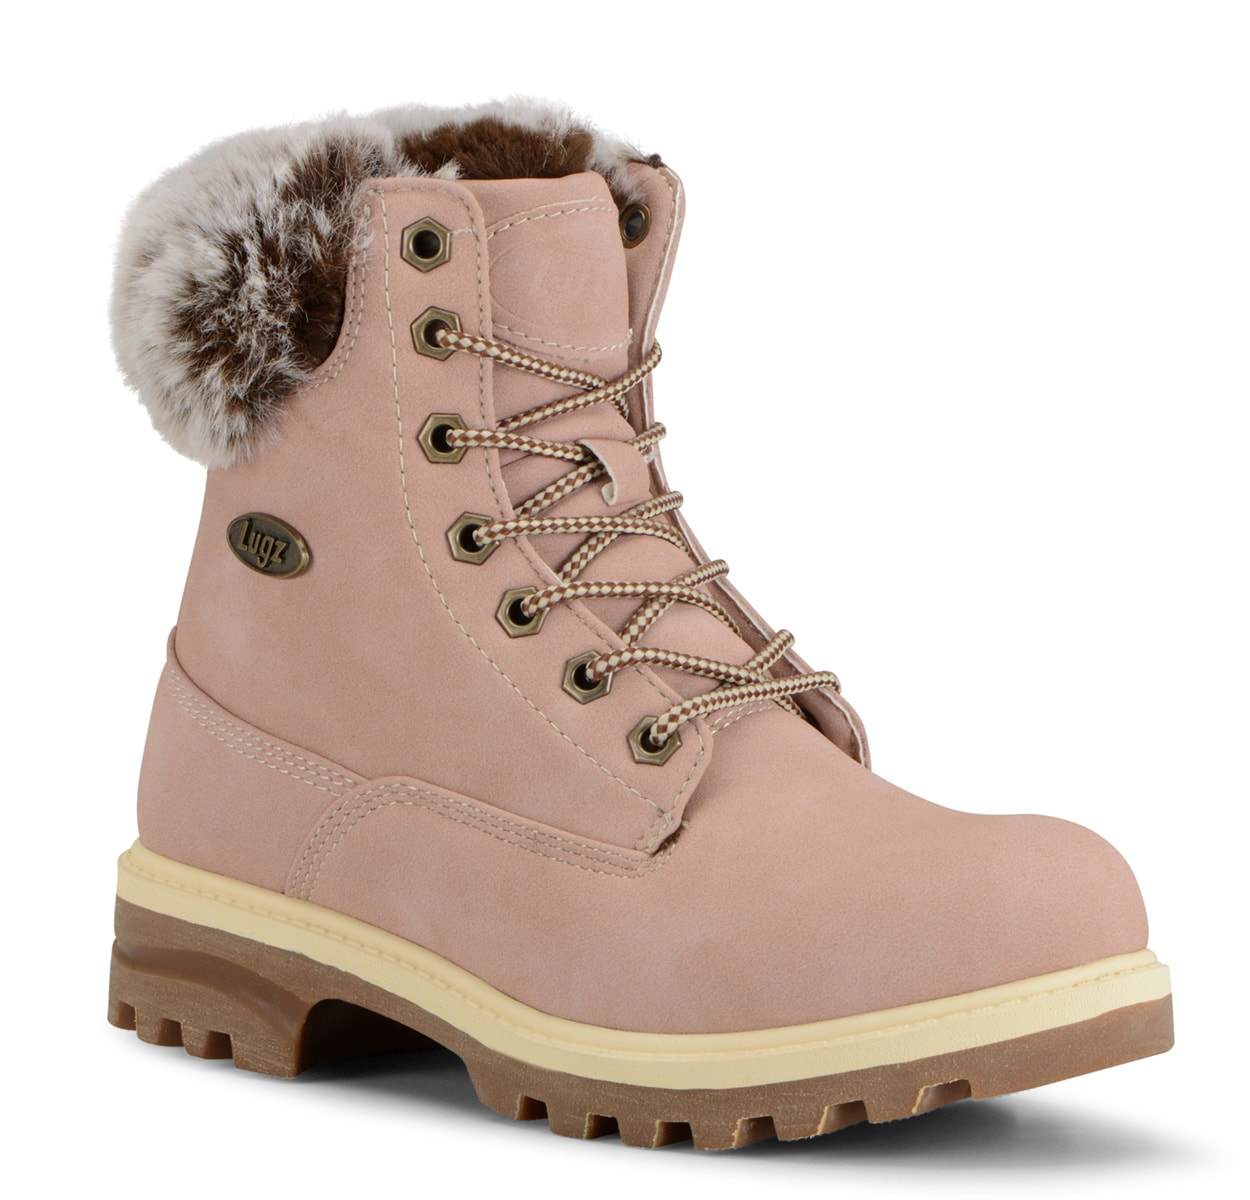 Women's Empire Hi Fur 6-Inch Boot (Choose Your Color: SOFT PINK/BONE/GUM, Choose Your Size: 6.5)